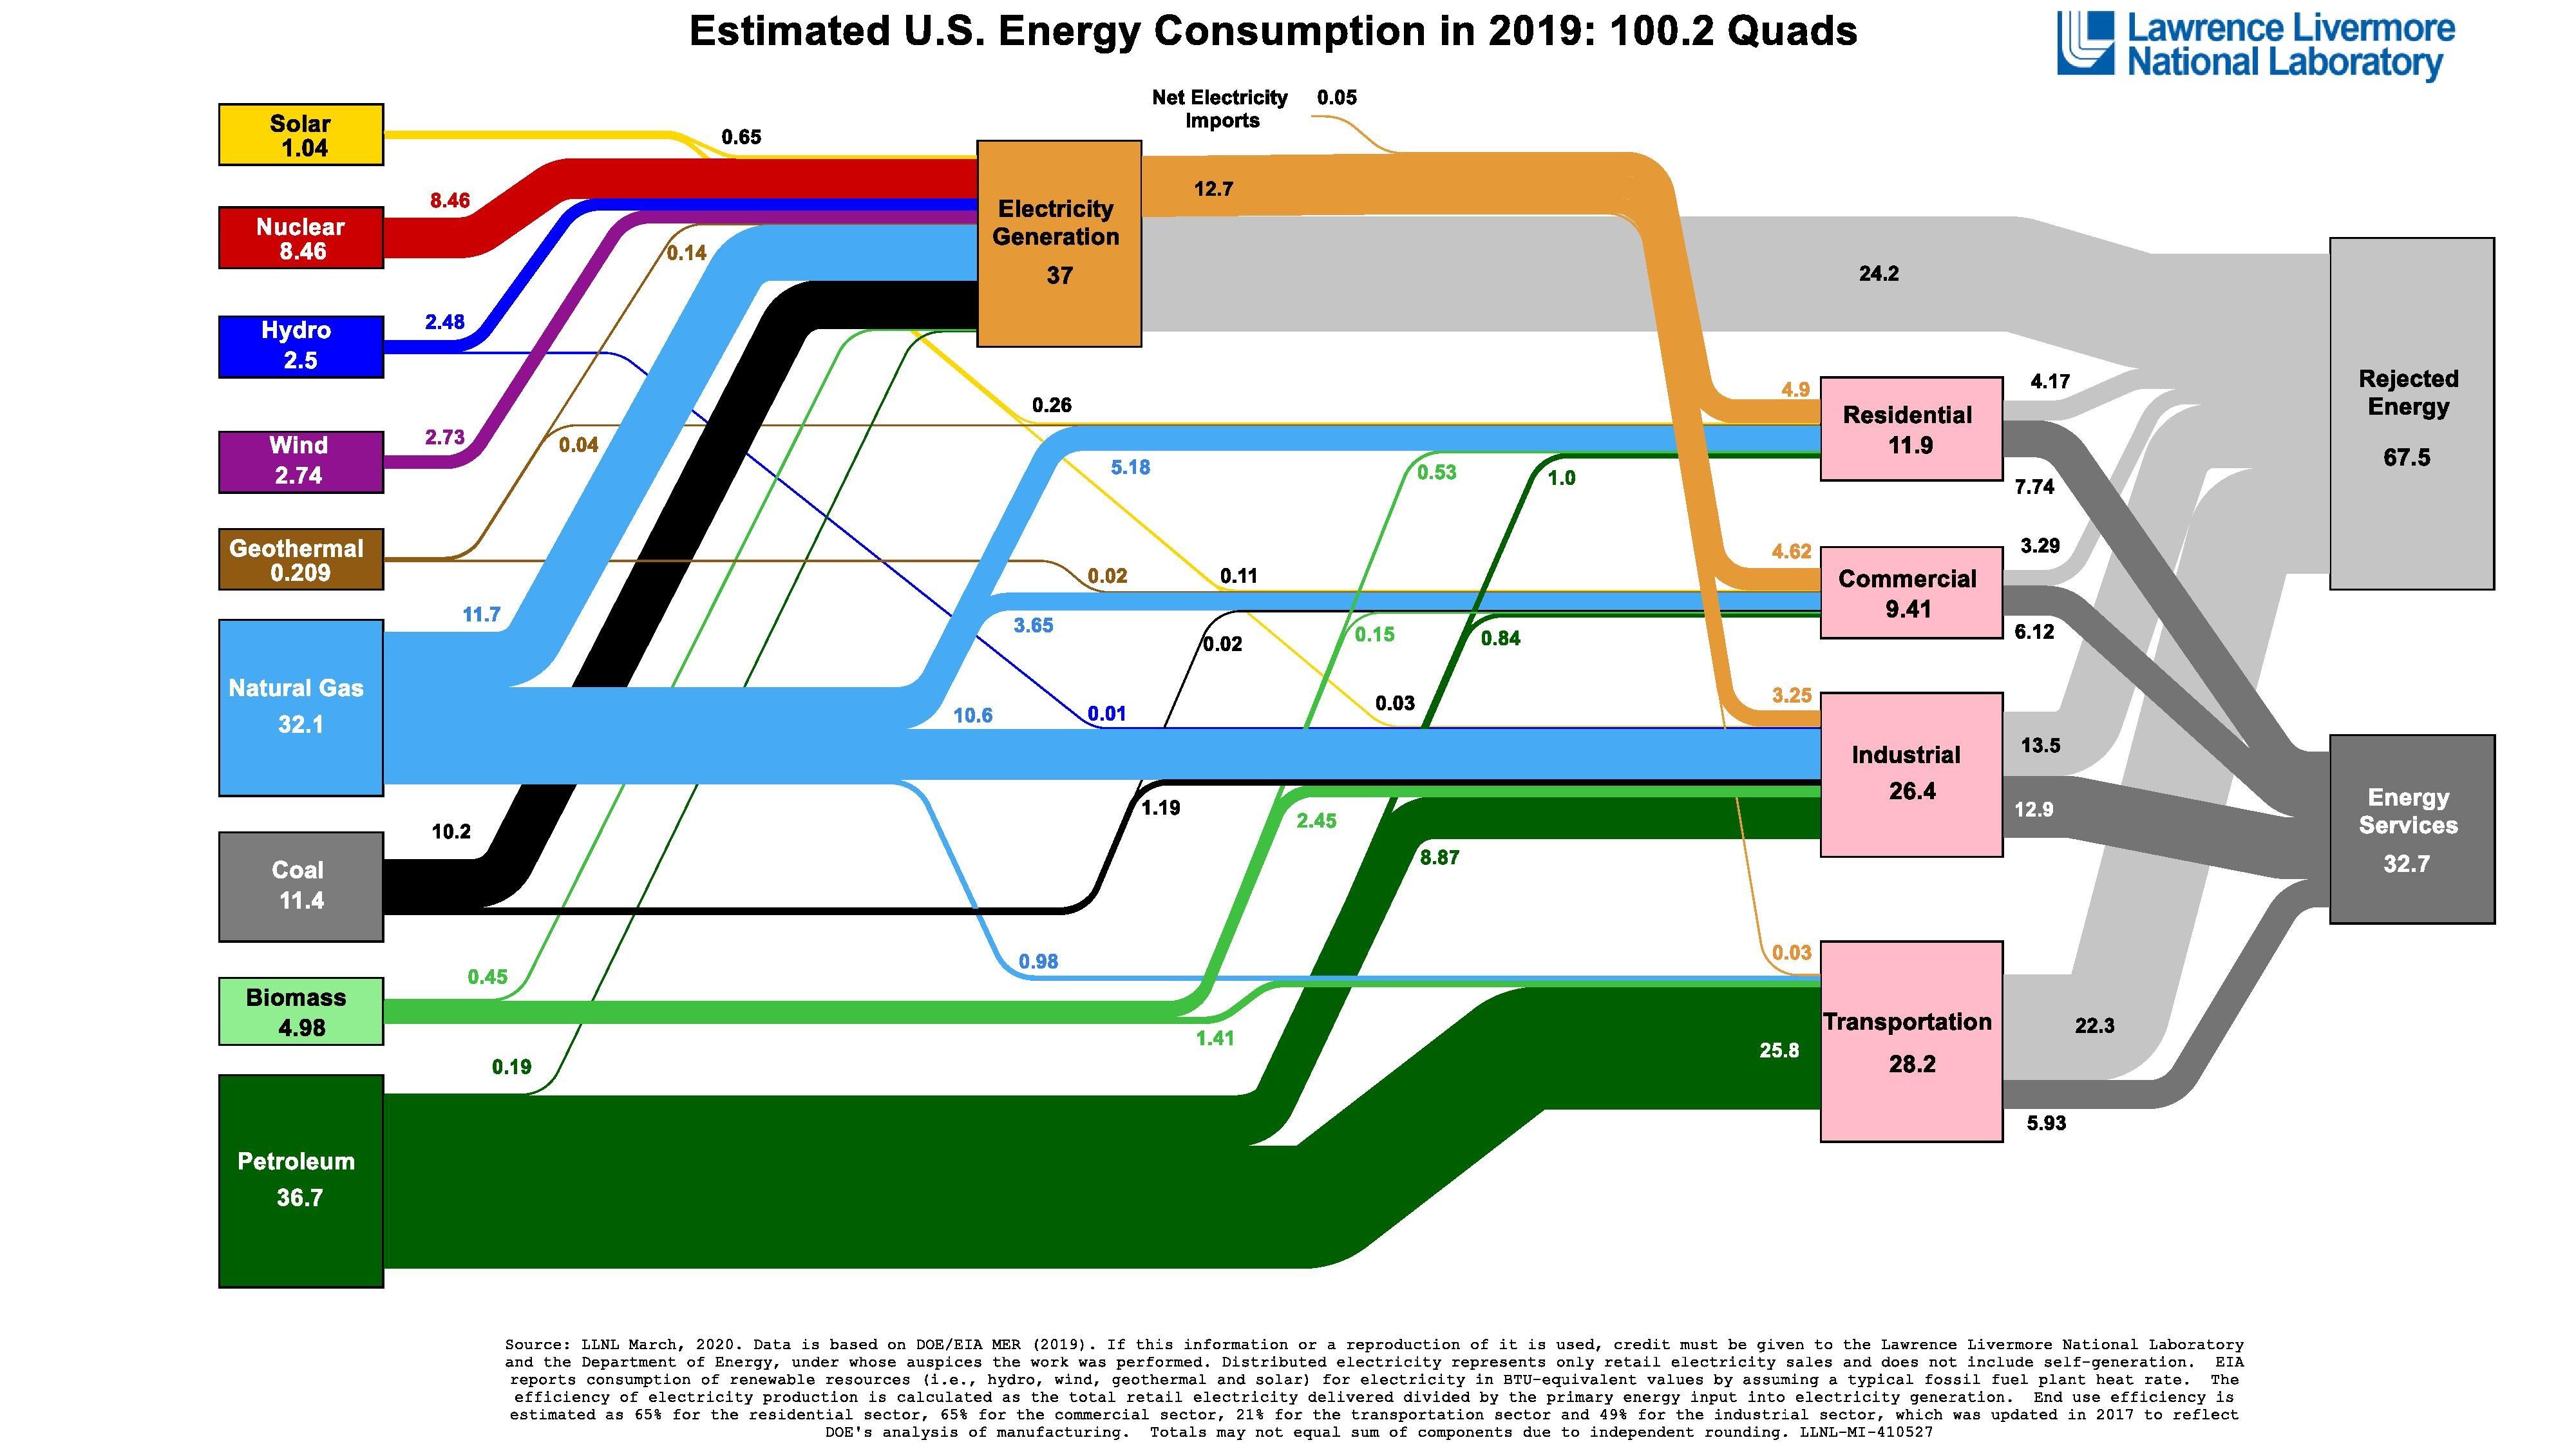 The Estimated U.S Energy Consumption In 2019: 100.2 Quads #infographic